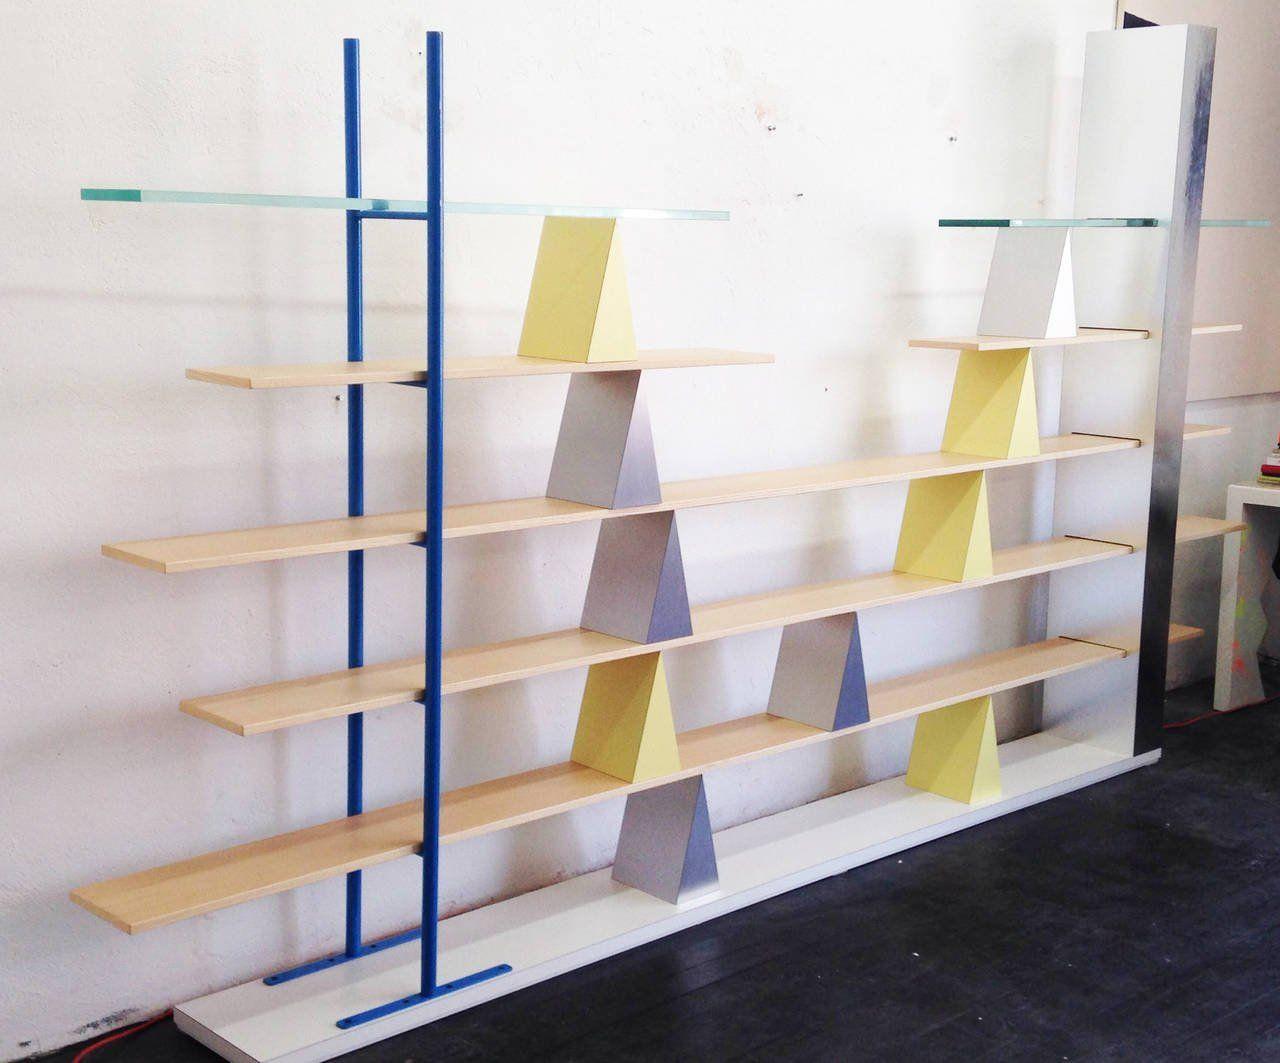 Andrea Branzi Gritti Shelves, Memphis Milano, 1981